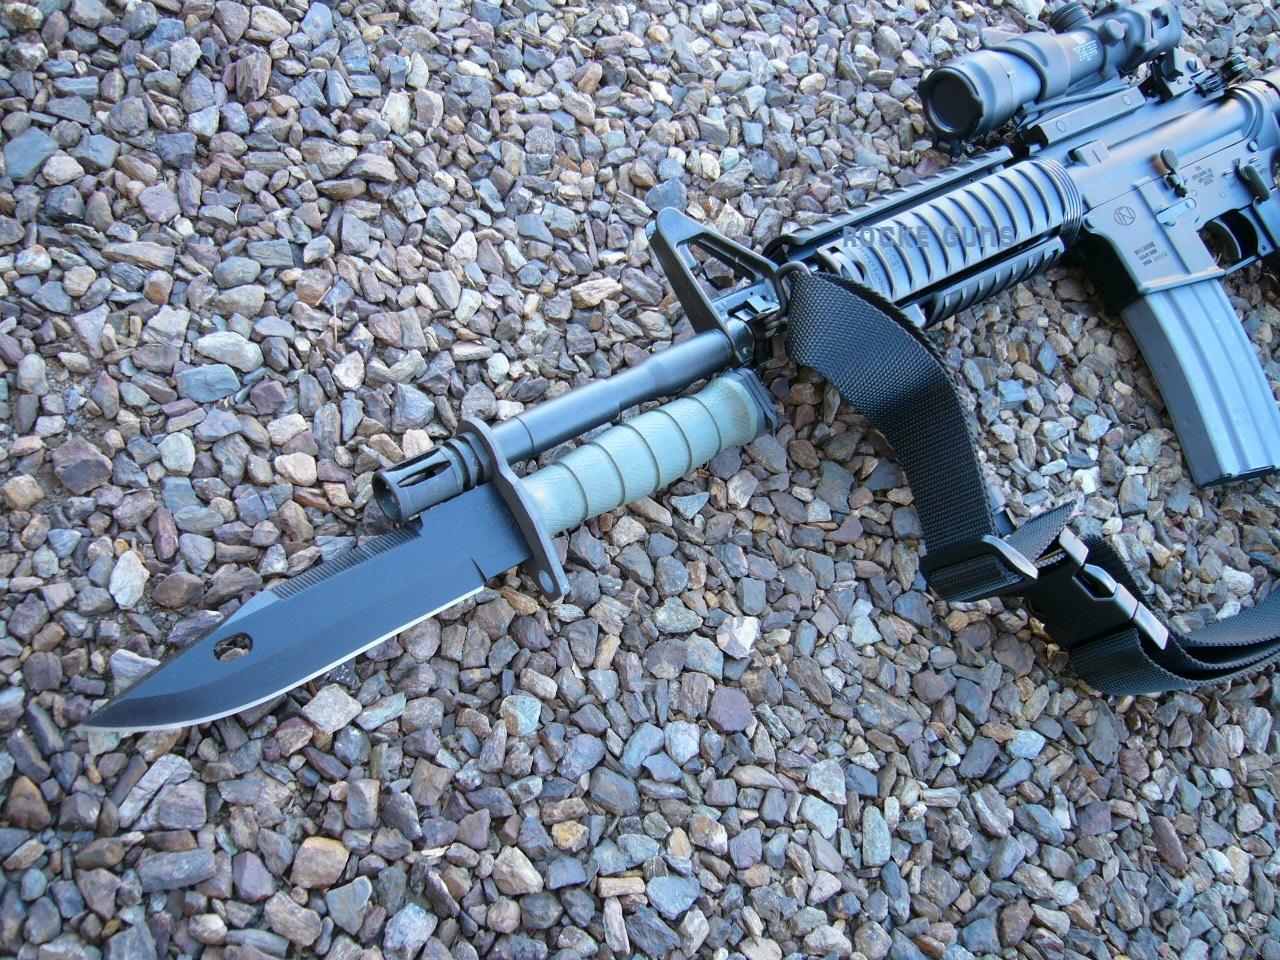 US ARMY ISSUE M4 DEPLOYMENT PKG CIVVIE LEGAL